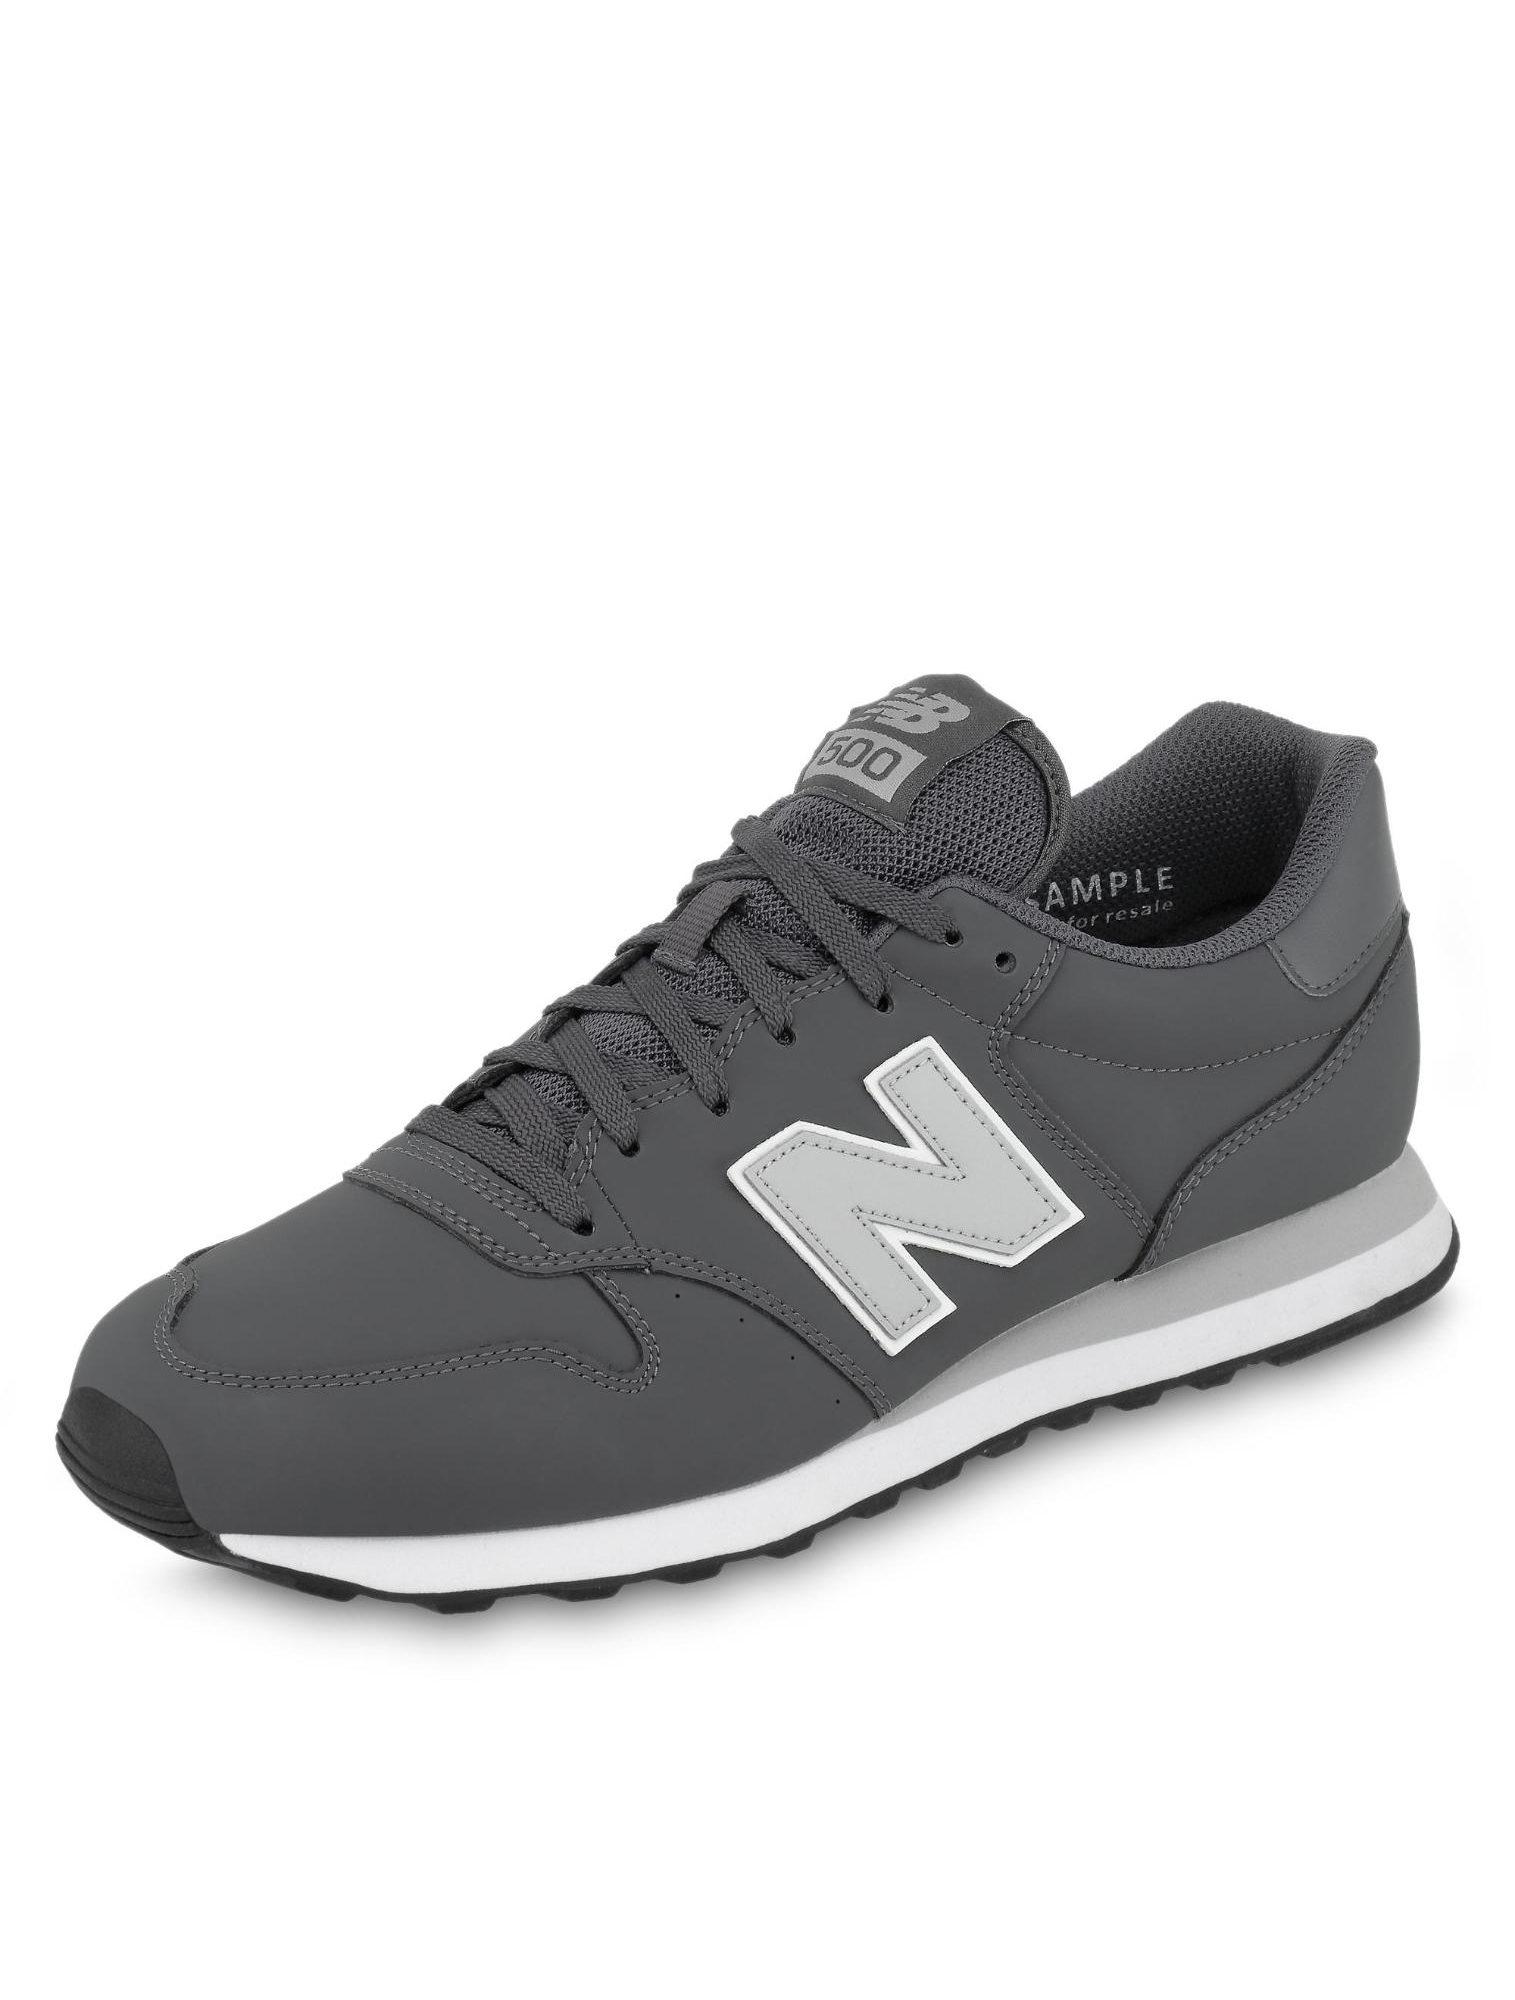 c3a95509d320d New Balance GM 500 Sneakers Shoes Sport sportswear liifestyle magnet ...